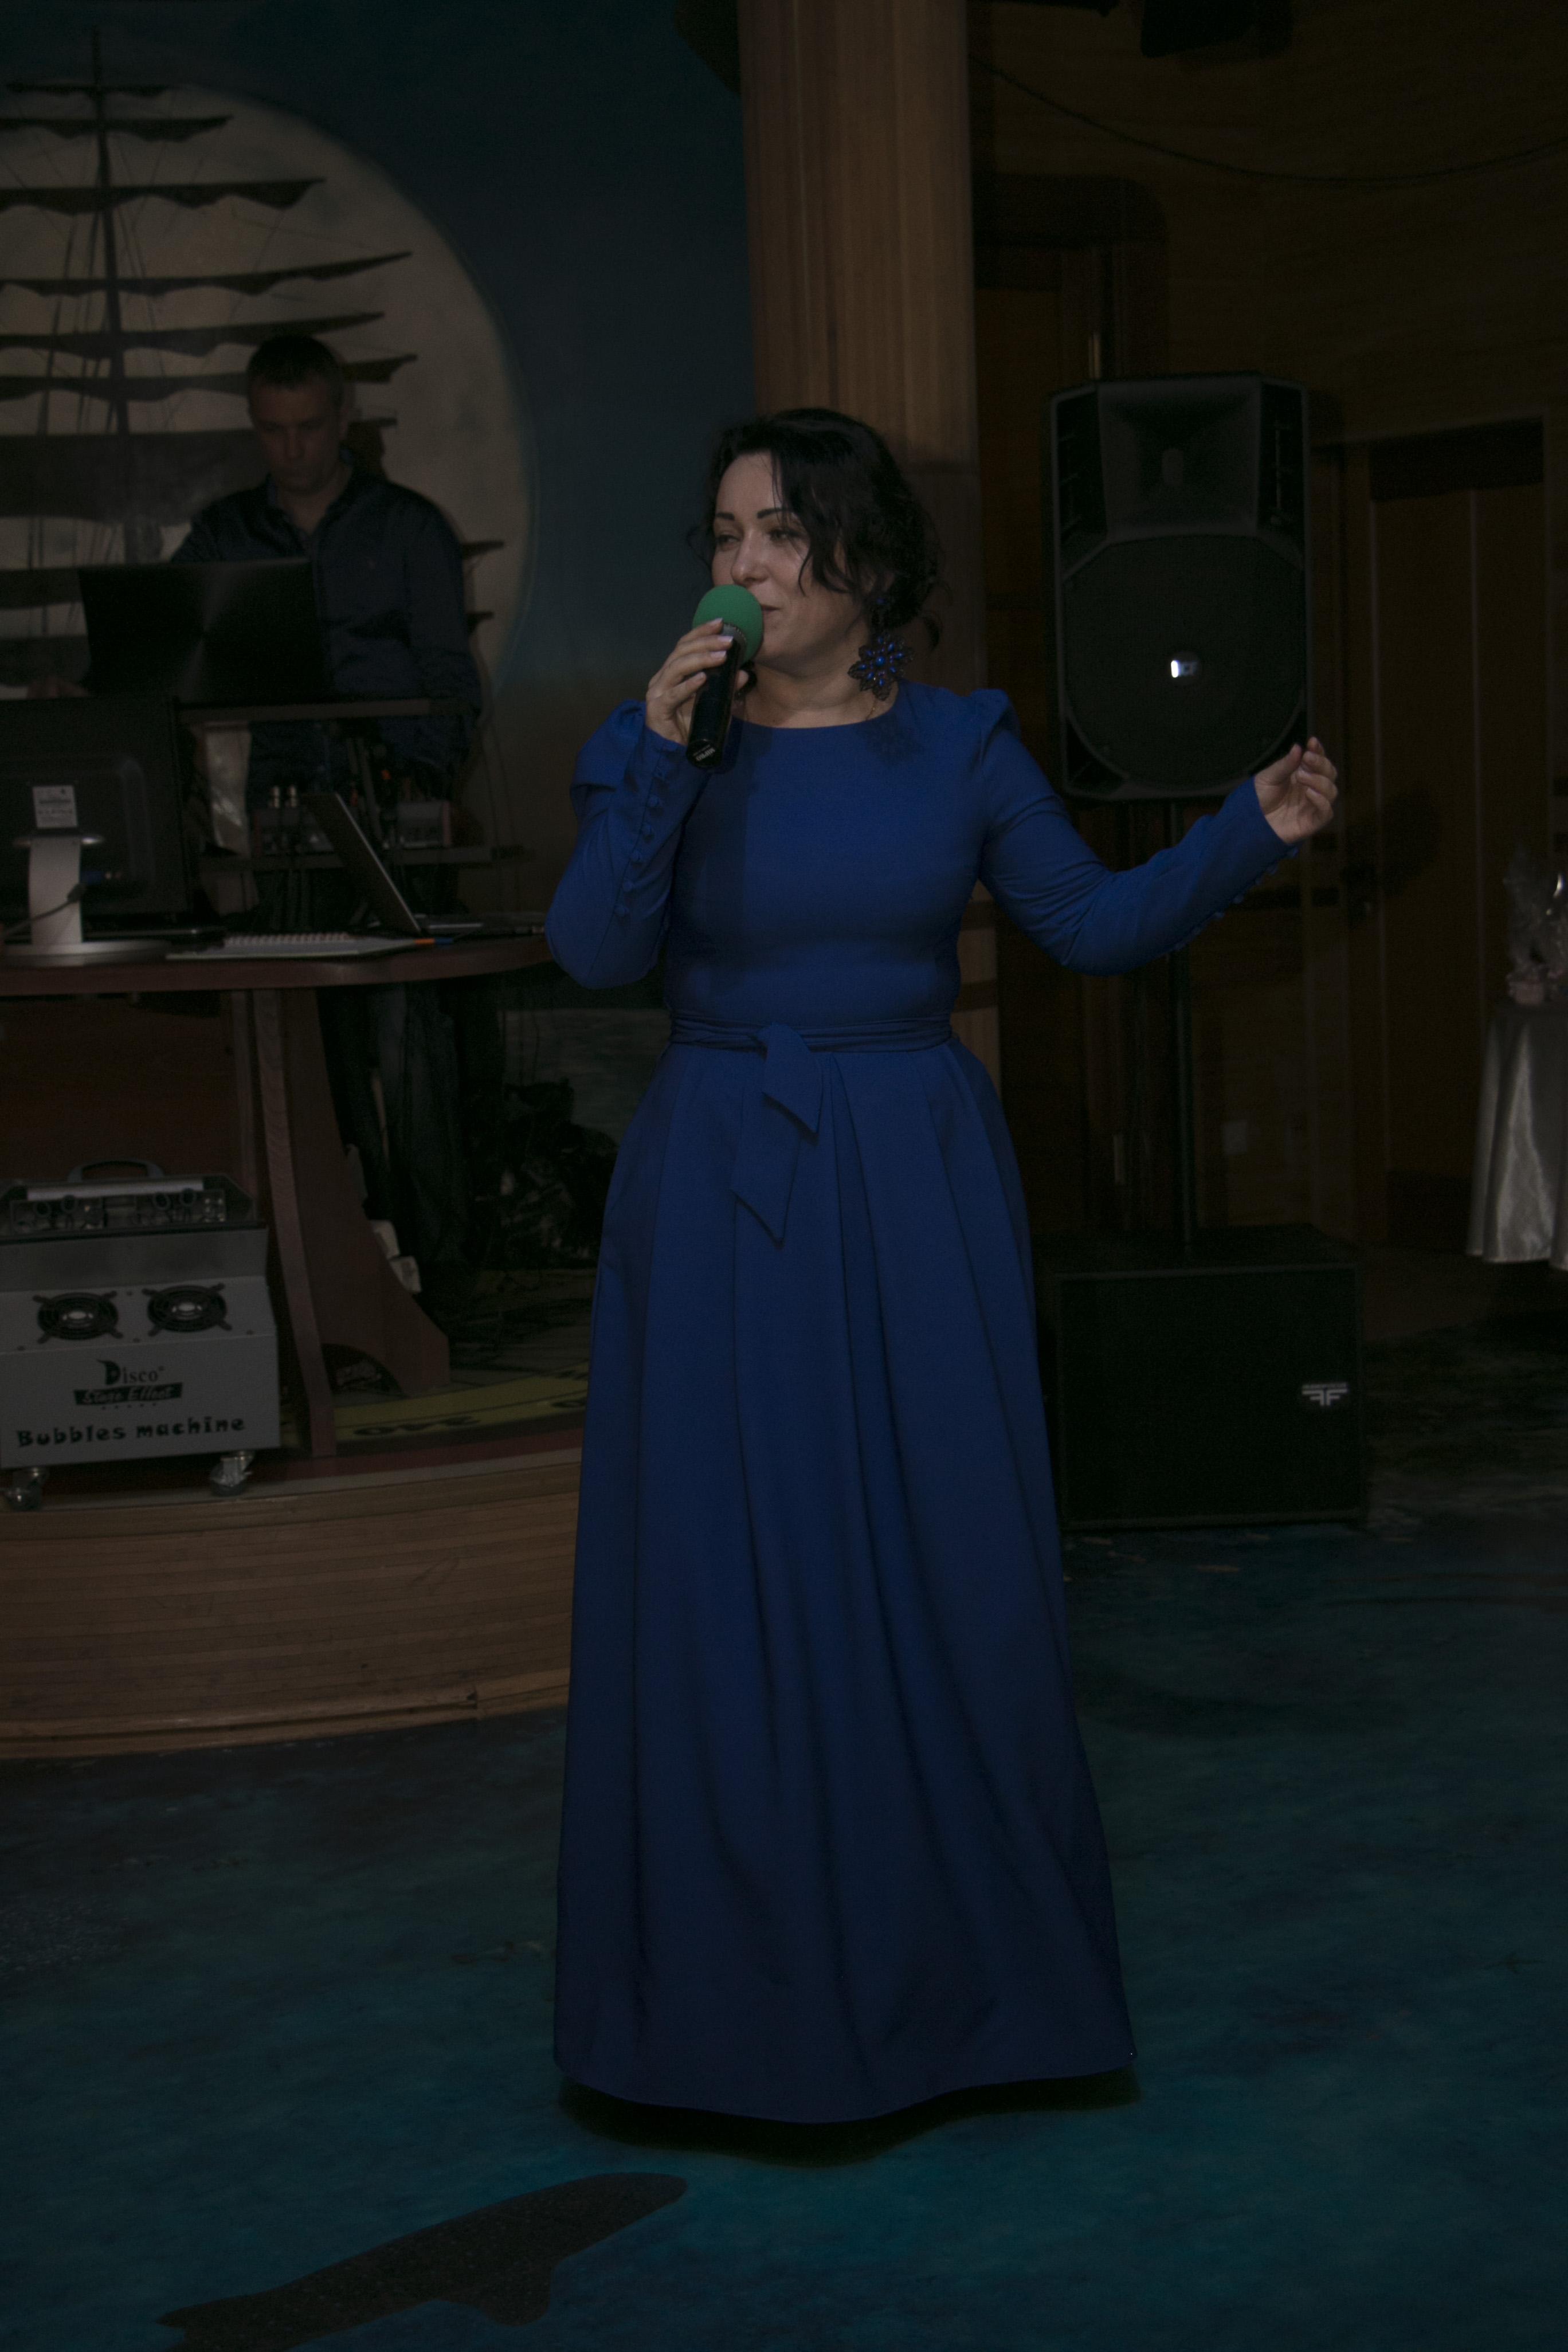 Виолетта Слепченко в Ростове-на-Дону